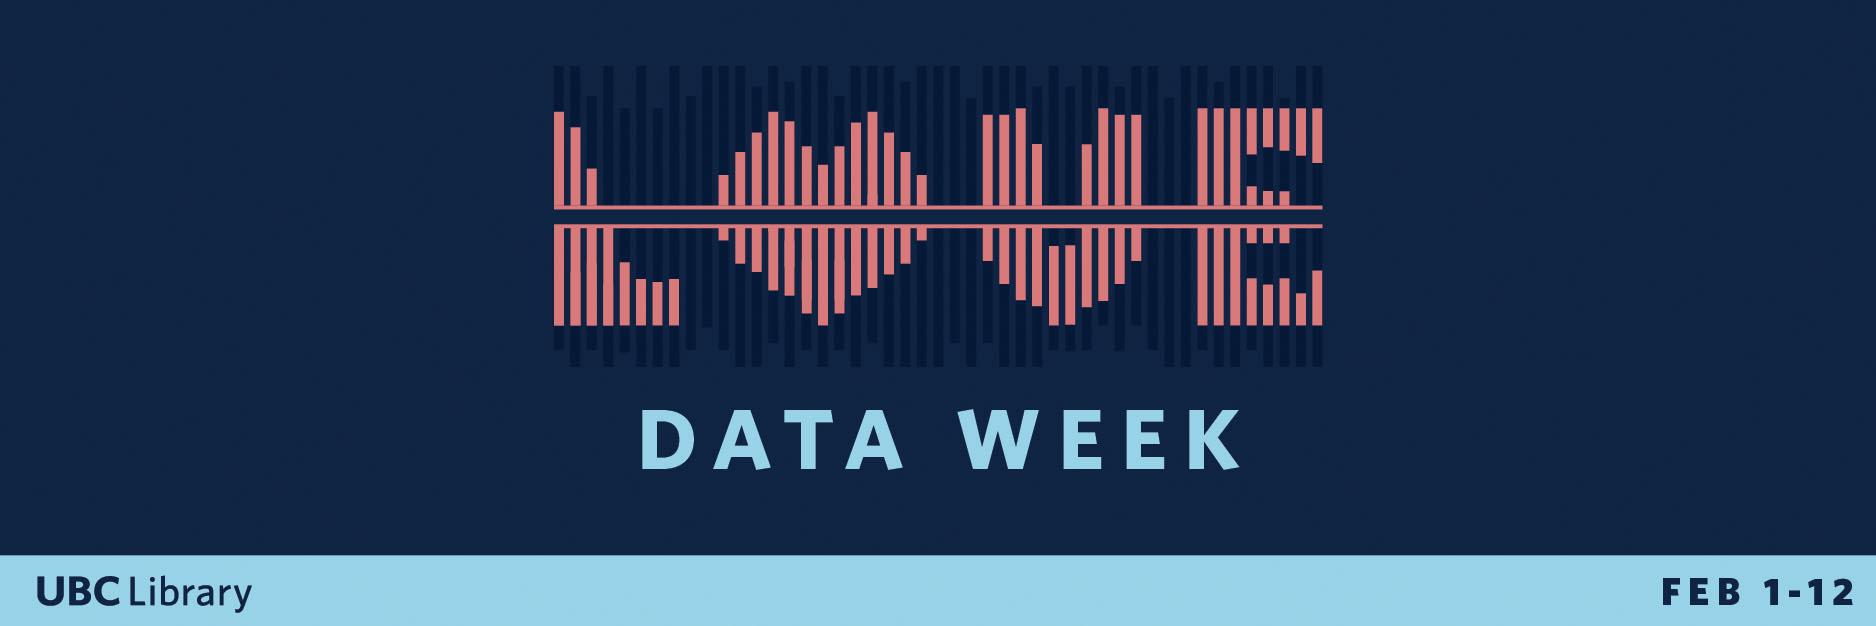 Text: Love Data Week, UBC Library, Feb 1-12